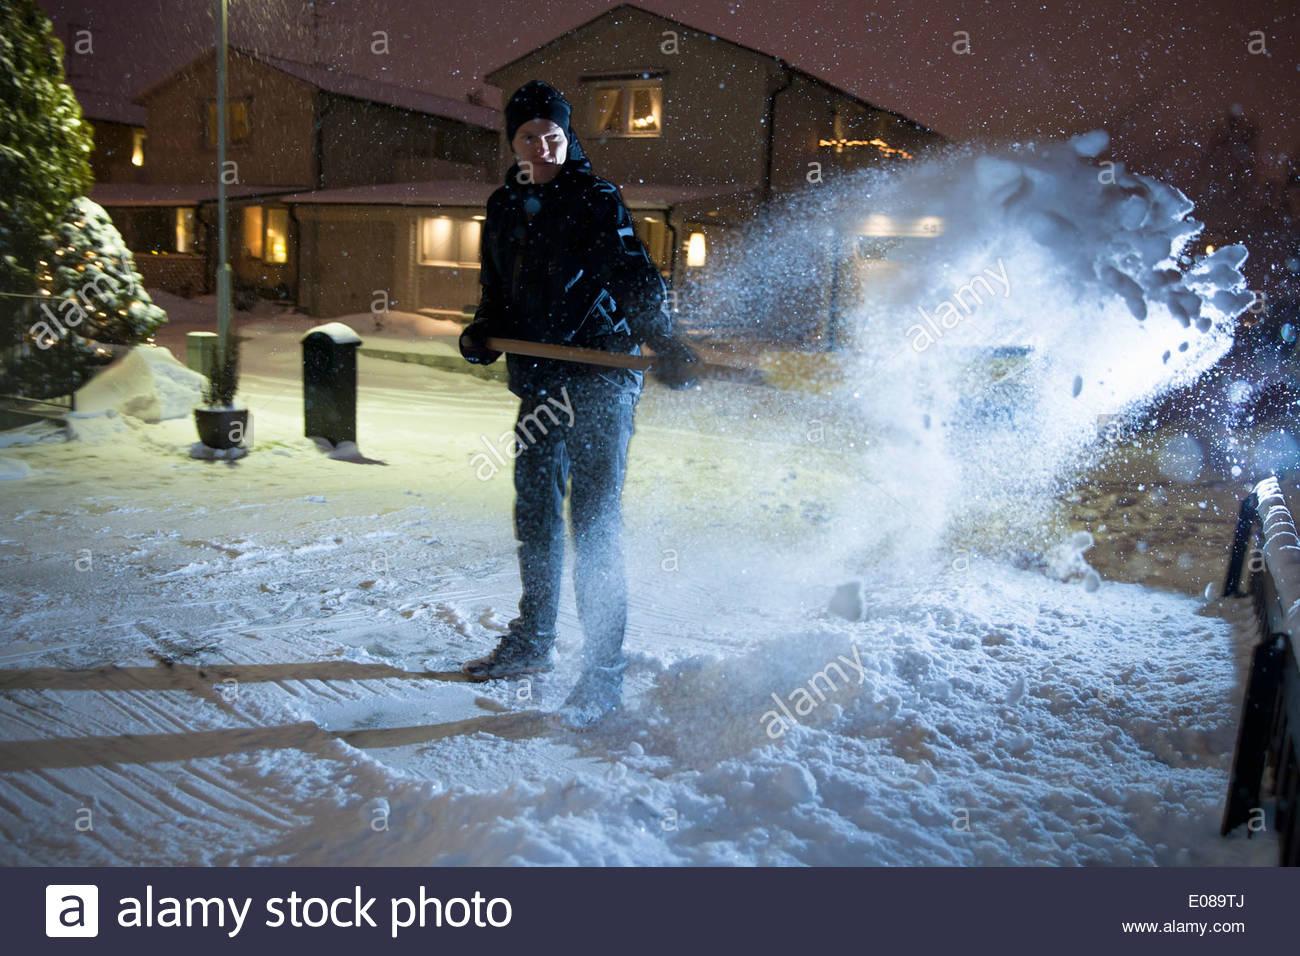 Longitud total del hombre retirar nieve desde la calle Imagen De Stock